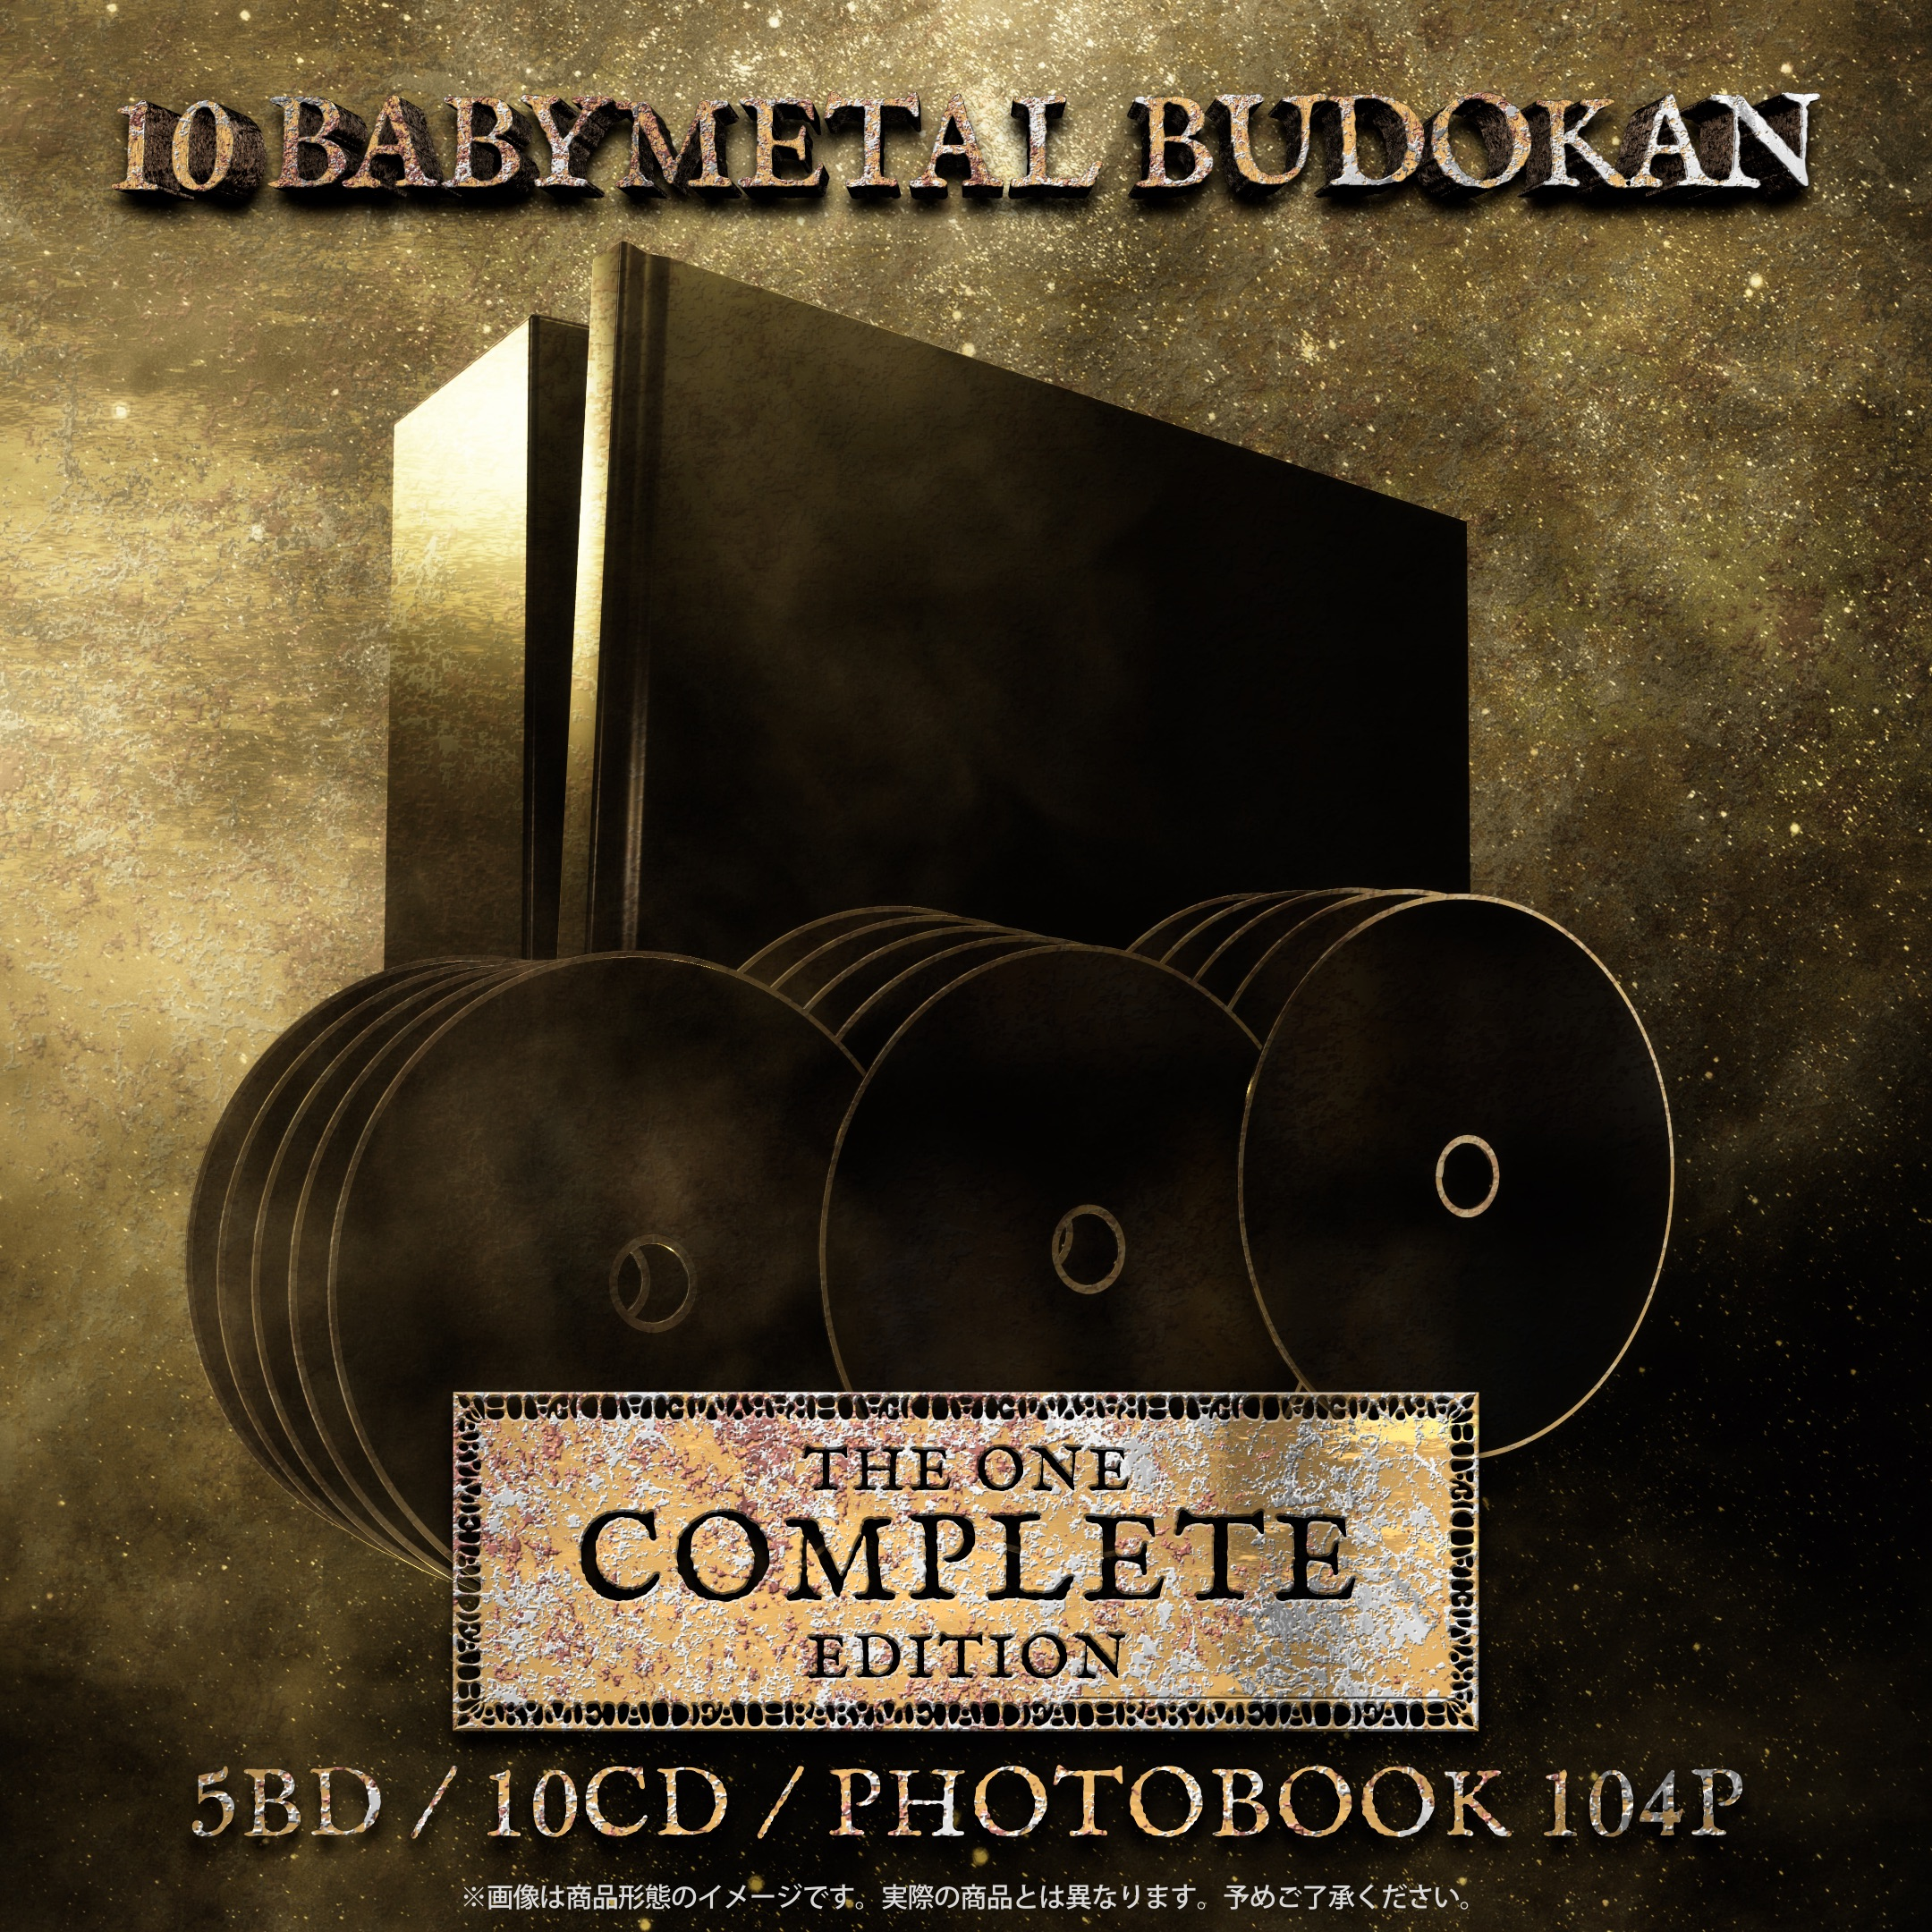 %e3%80%8e10-babymetal-budokan%e3%80%8f-the-one-complete-edition